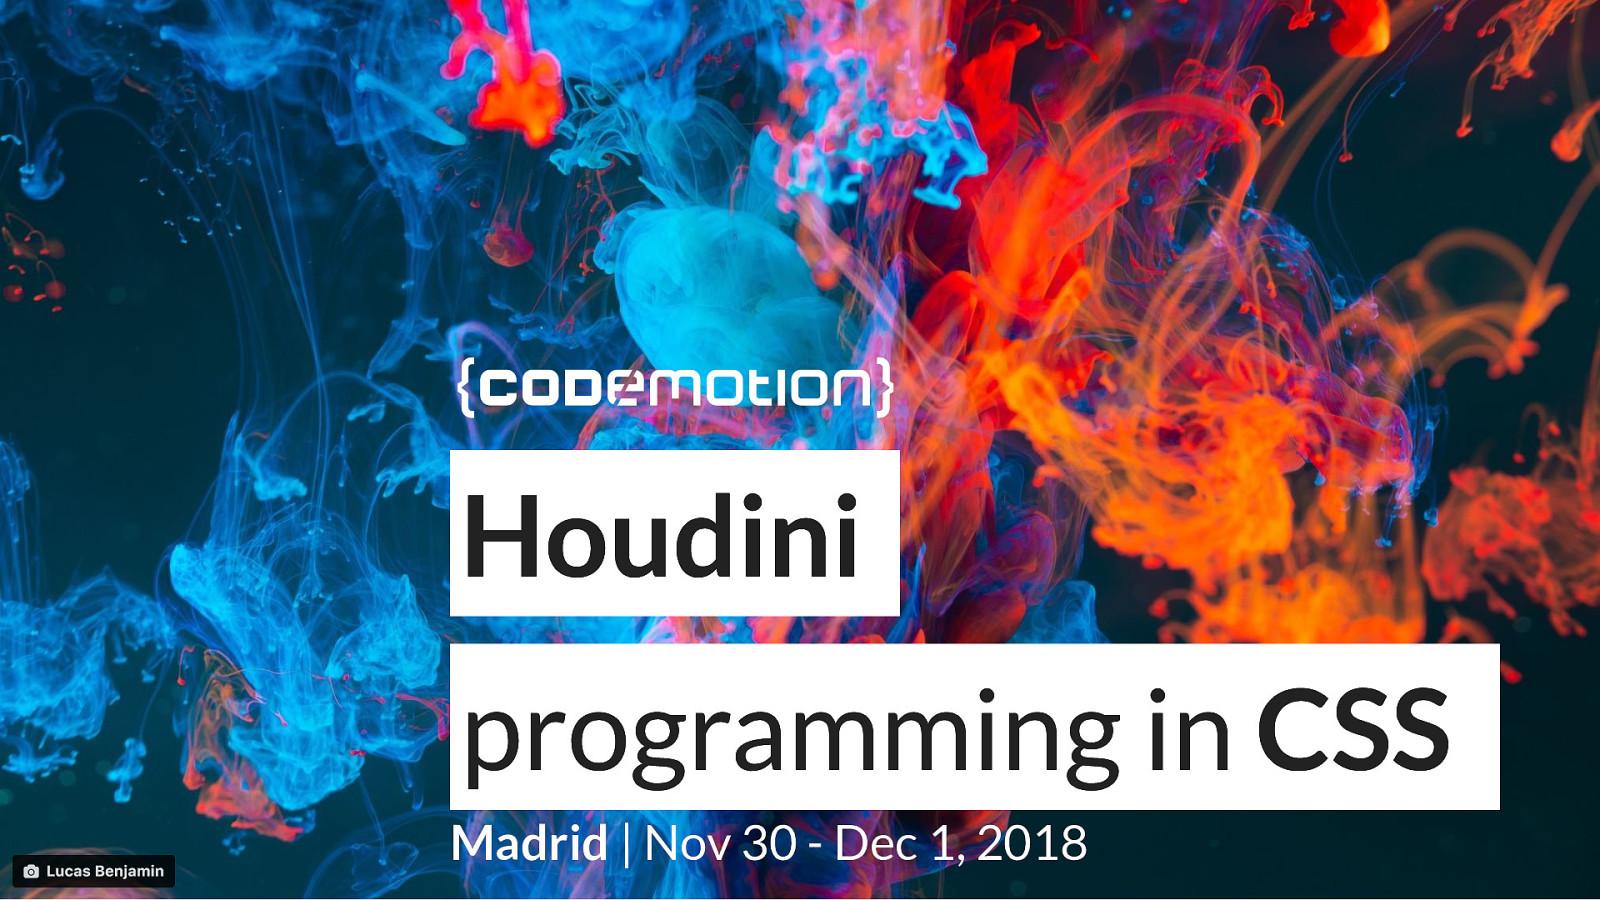 Houdini: programming in CSS